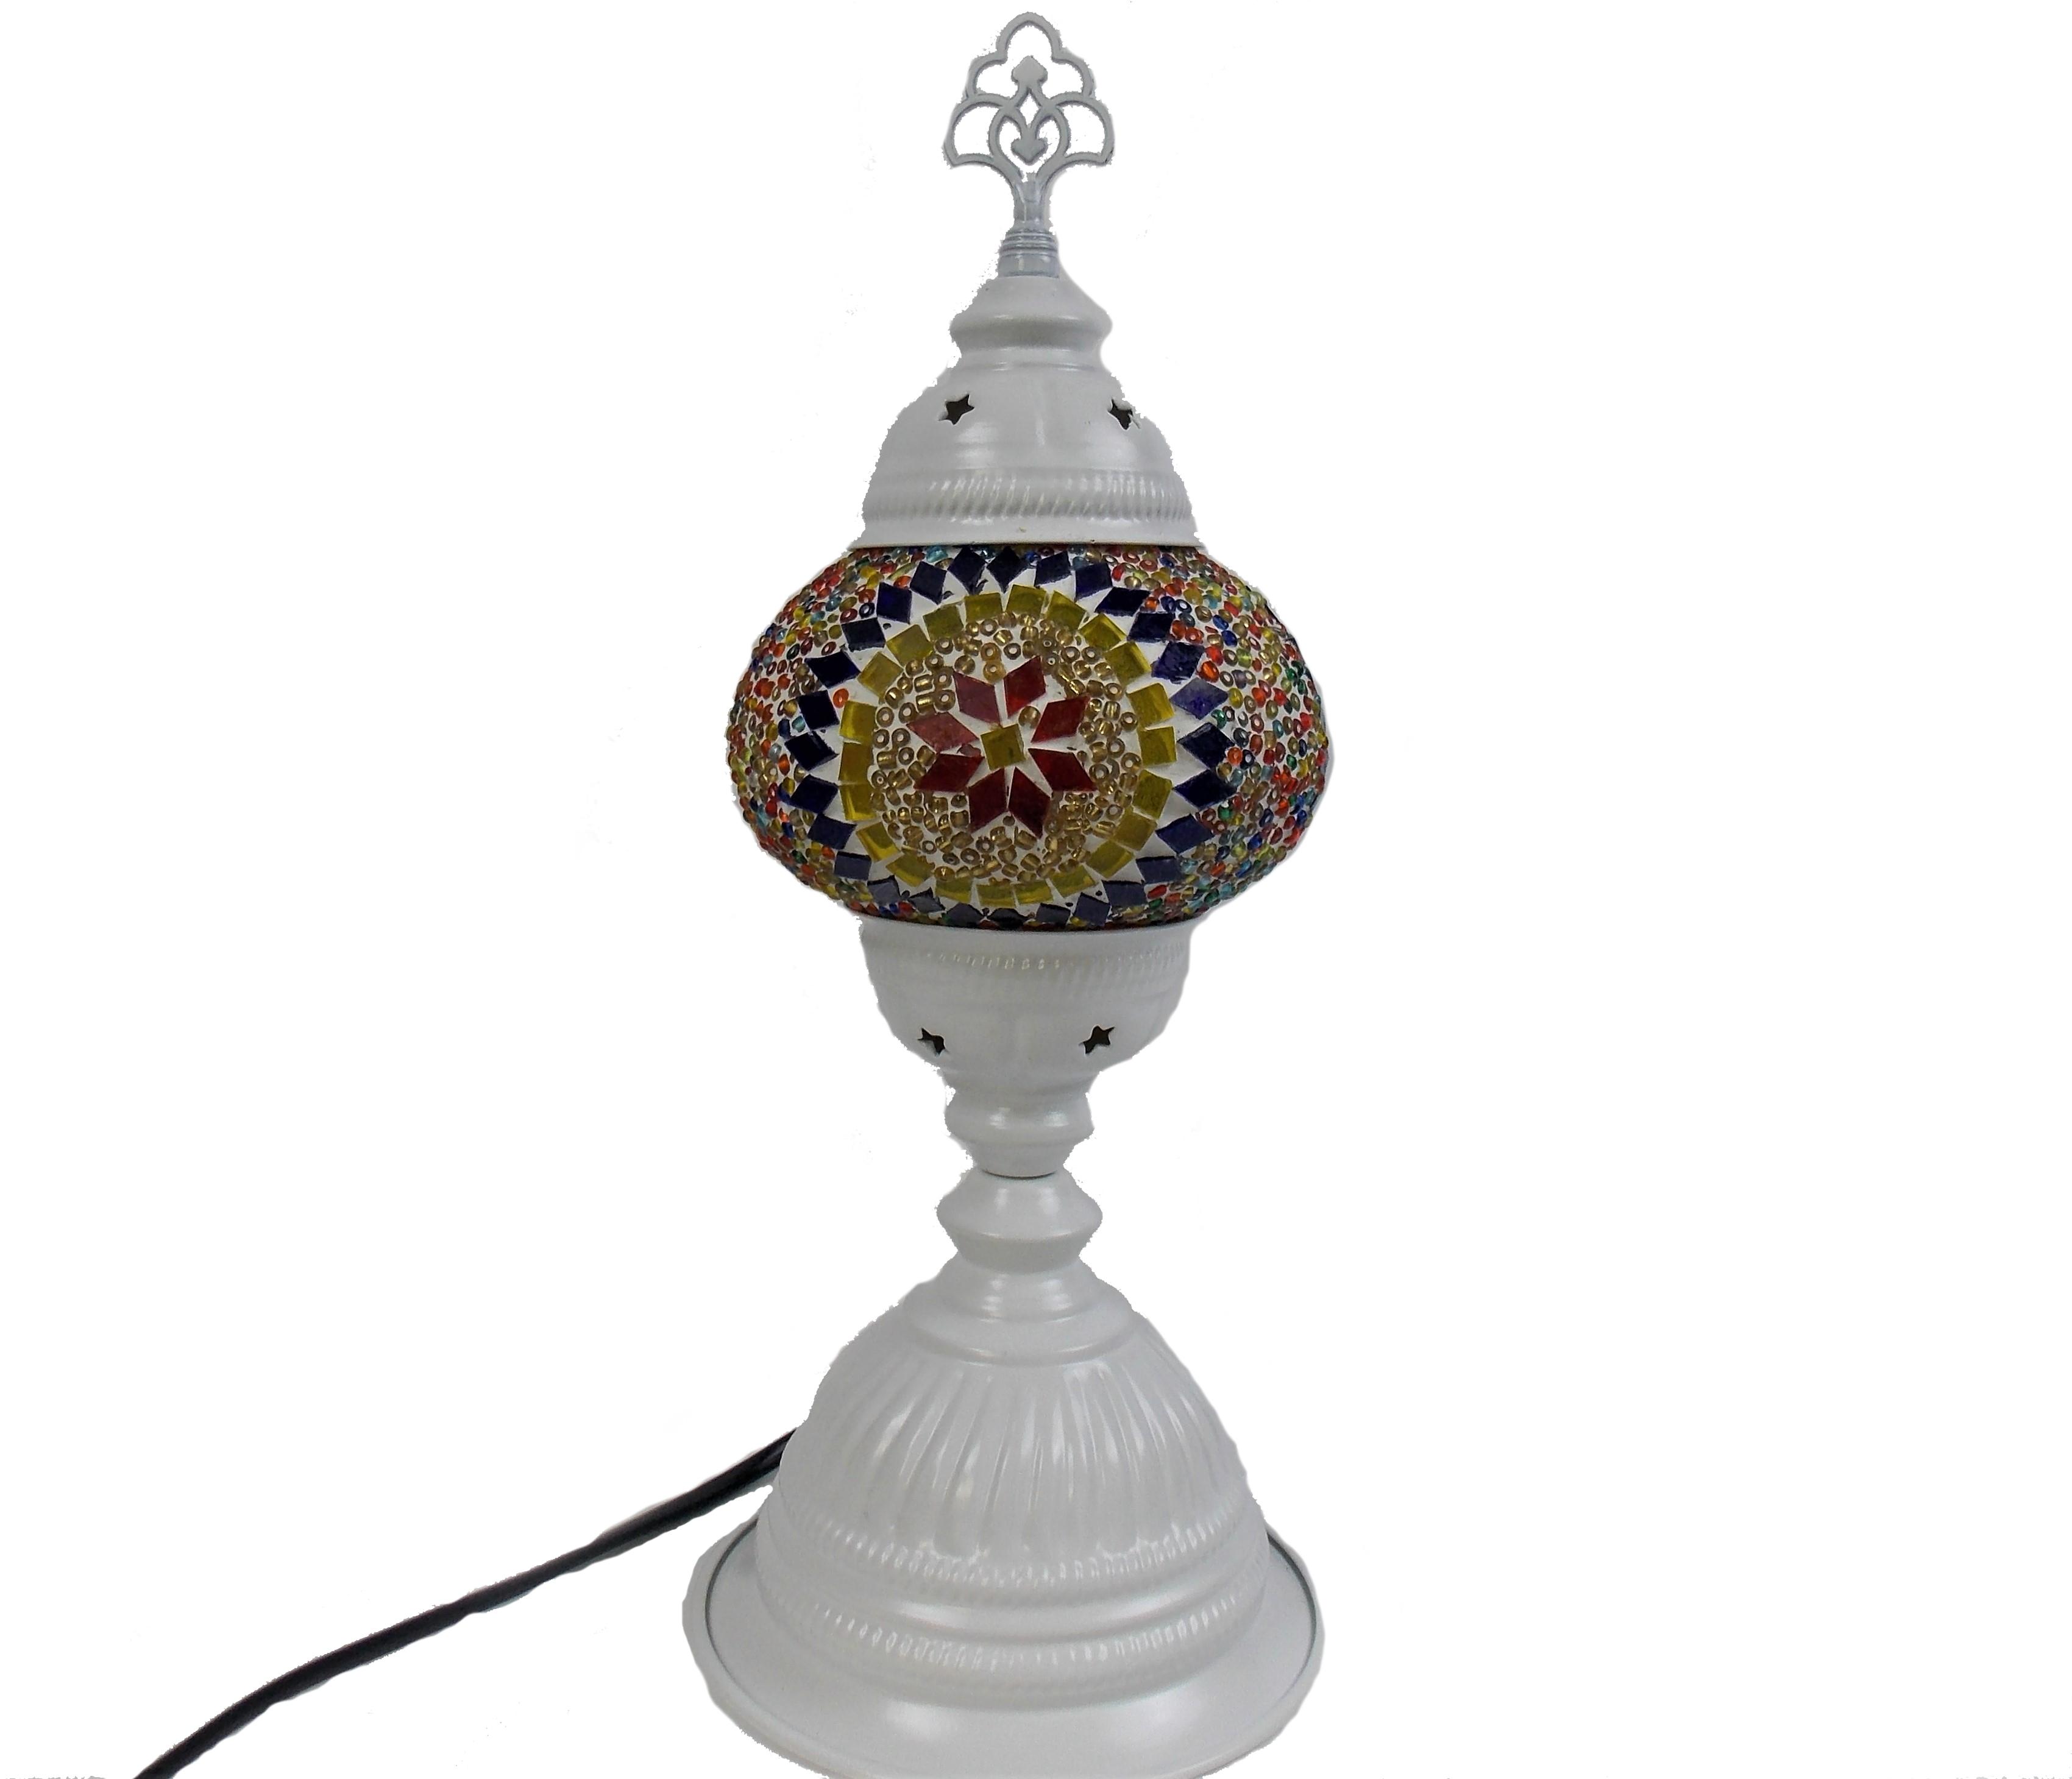 Lampa mozaic orientala handmade 38 cm h